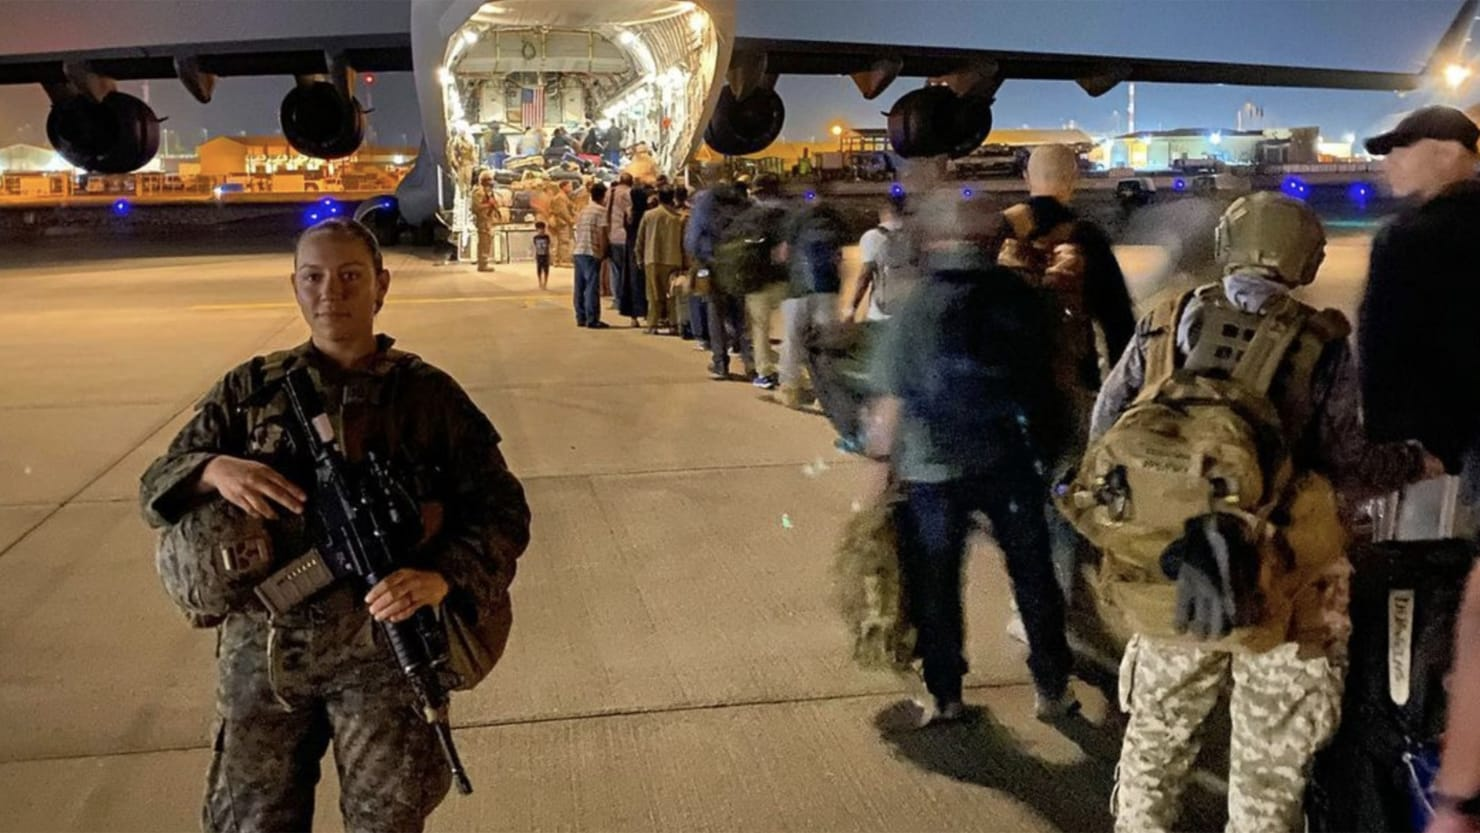 Russian State TV Host Compares Slain Kabul Marine to Ashli Babbitt in Deranged Rant